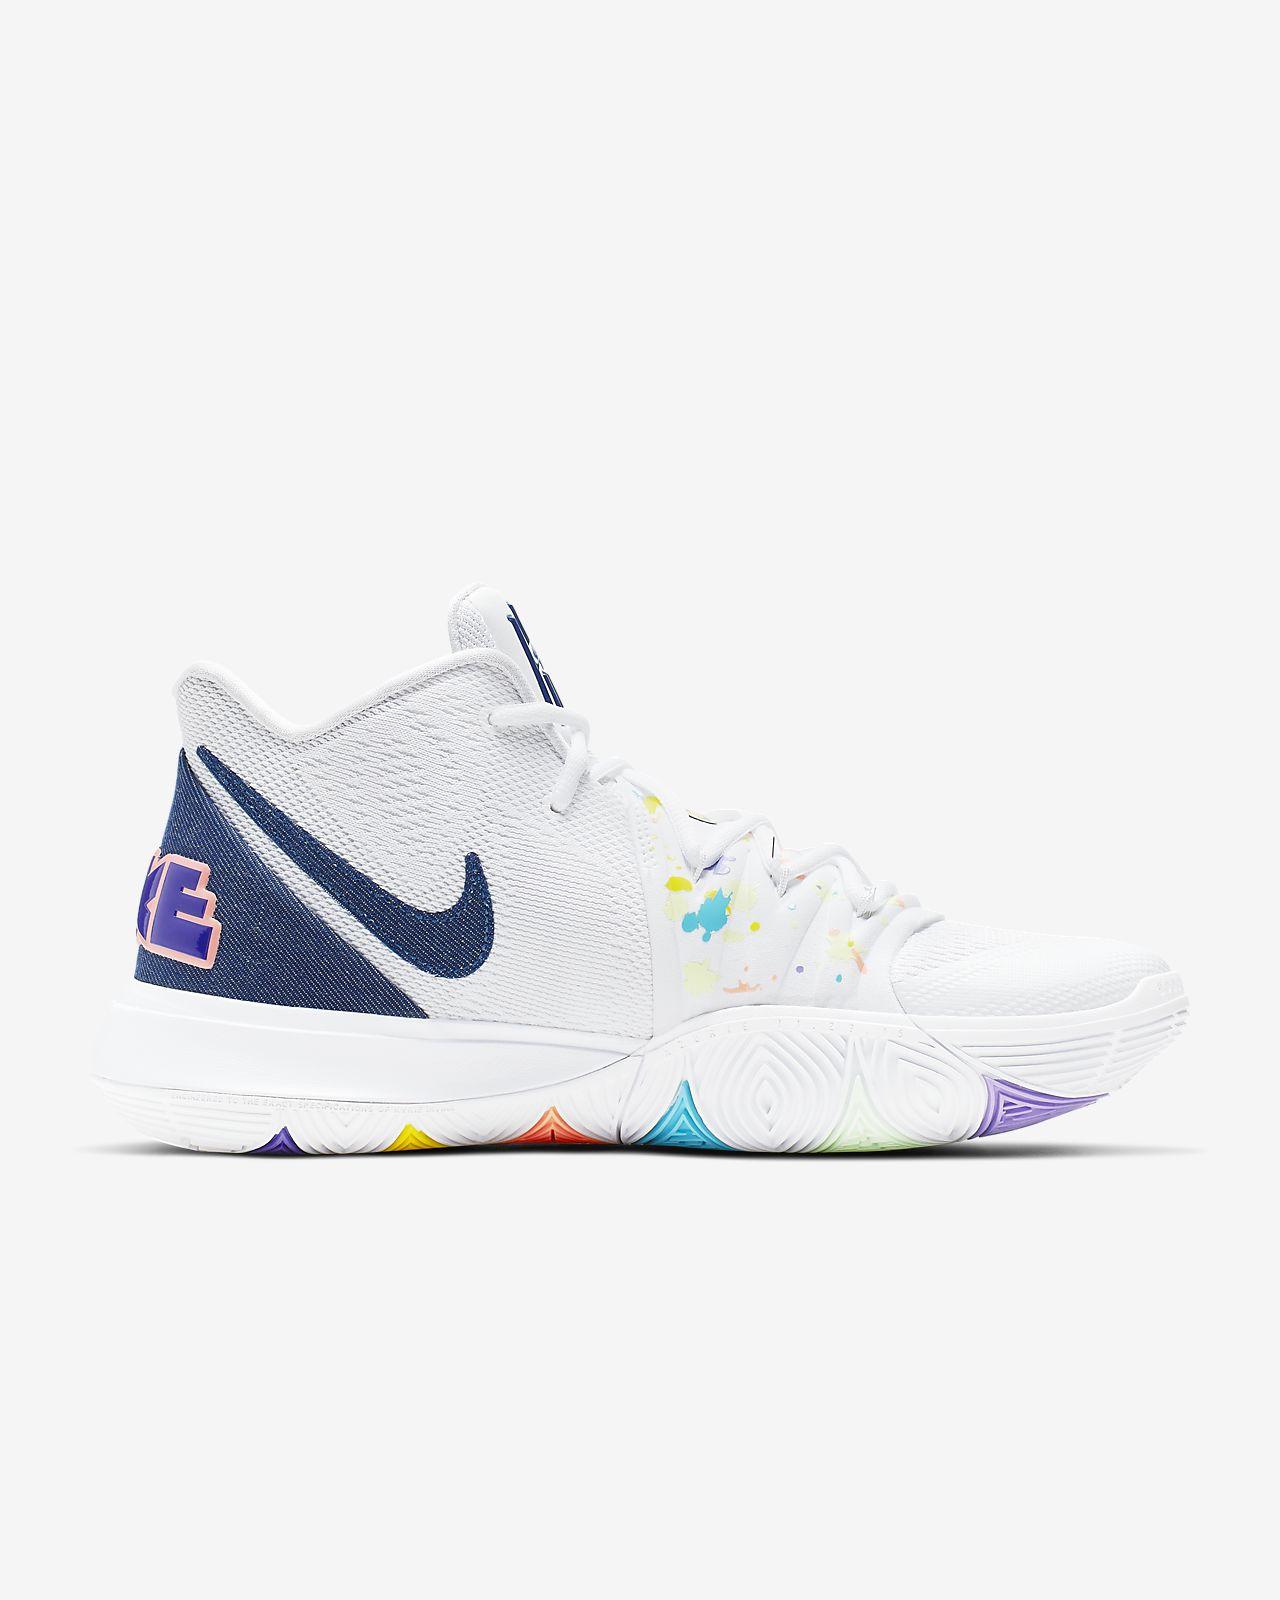 meilleur service 2960b 8225c Kyrie 5 Basketball Shoe